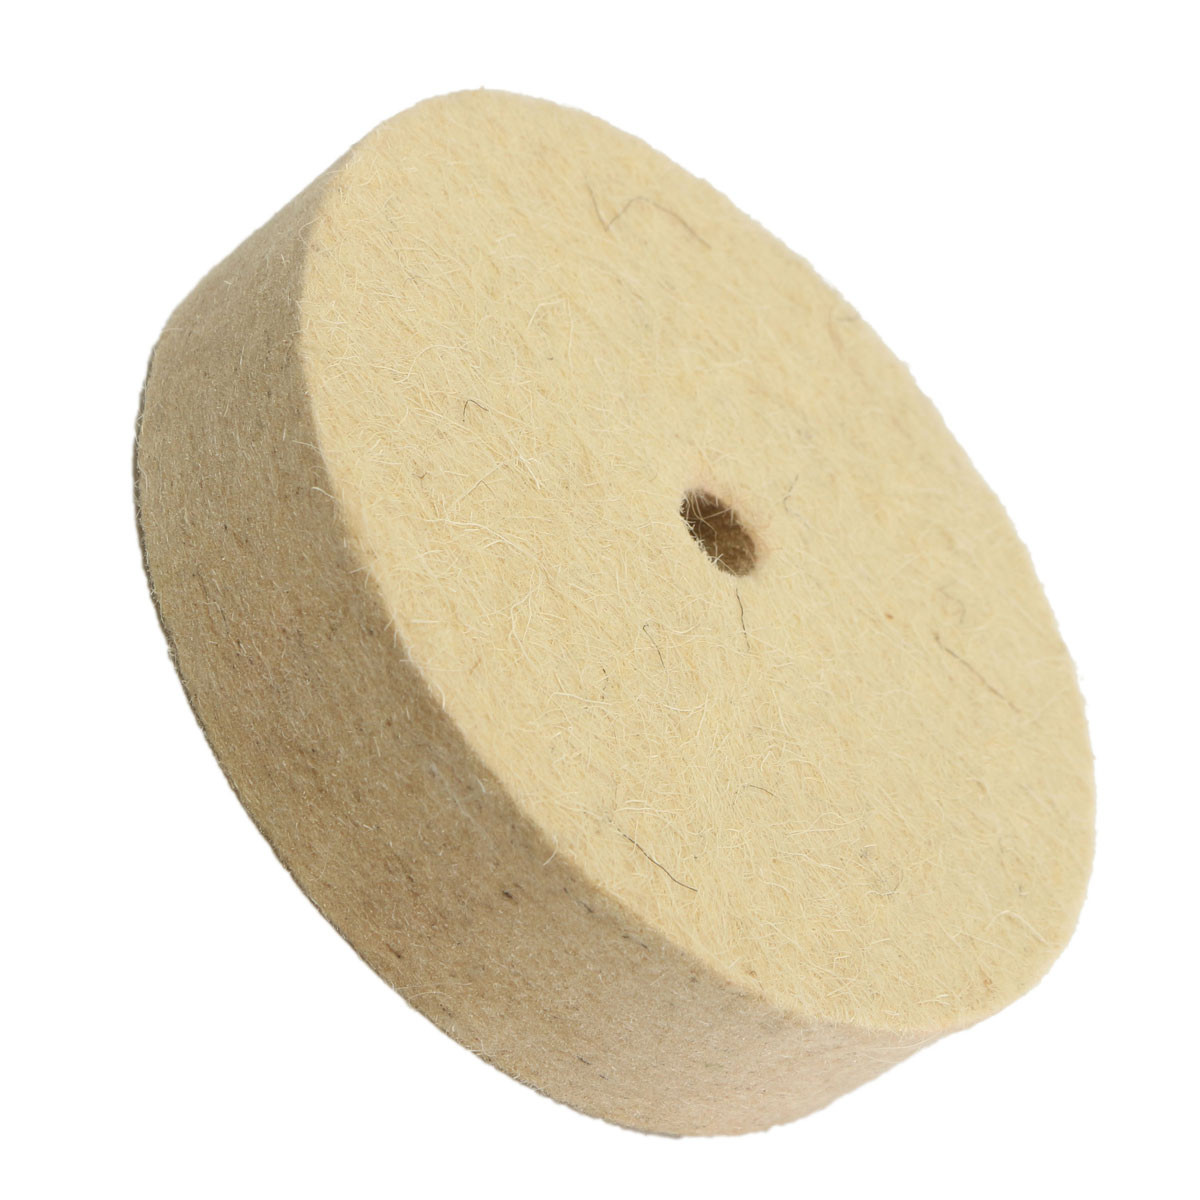 1pc  6 Inch 150mm Polishing Buffing Wheel Wool Felt Polisher Disc Pad Abrasive Tools 150x25mm